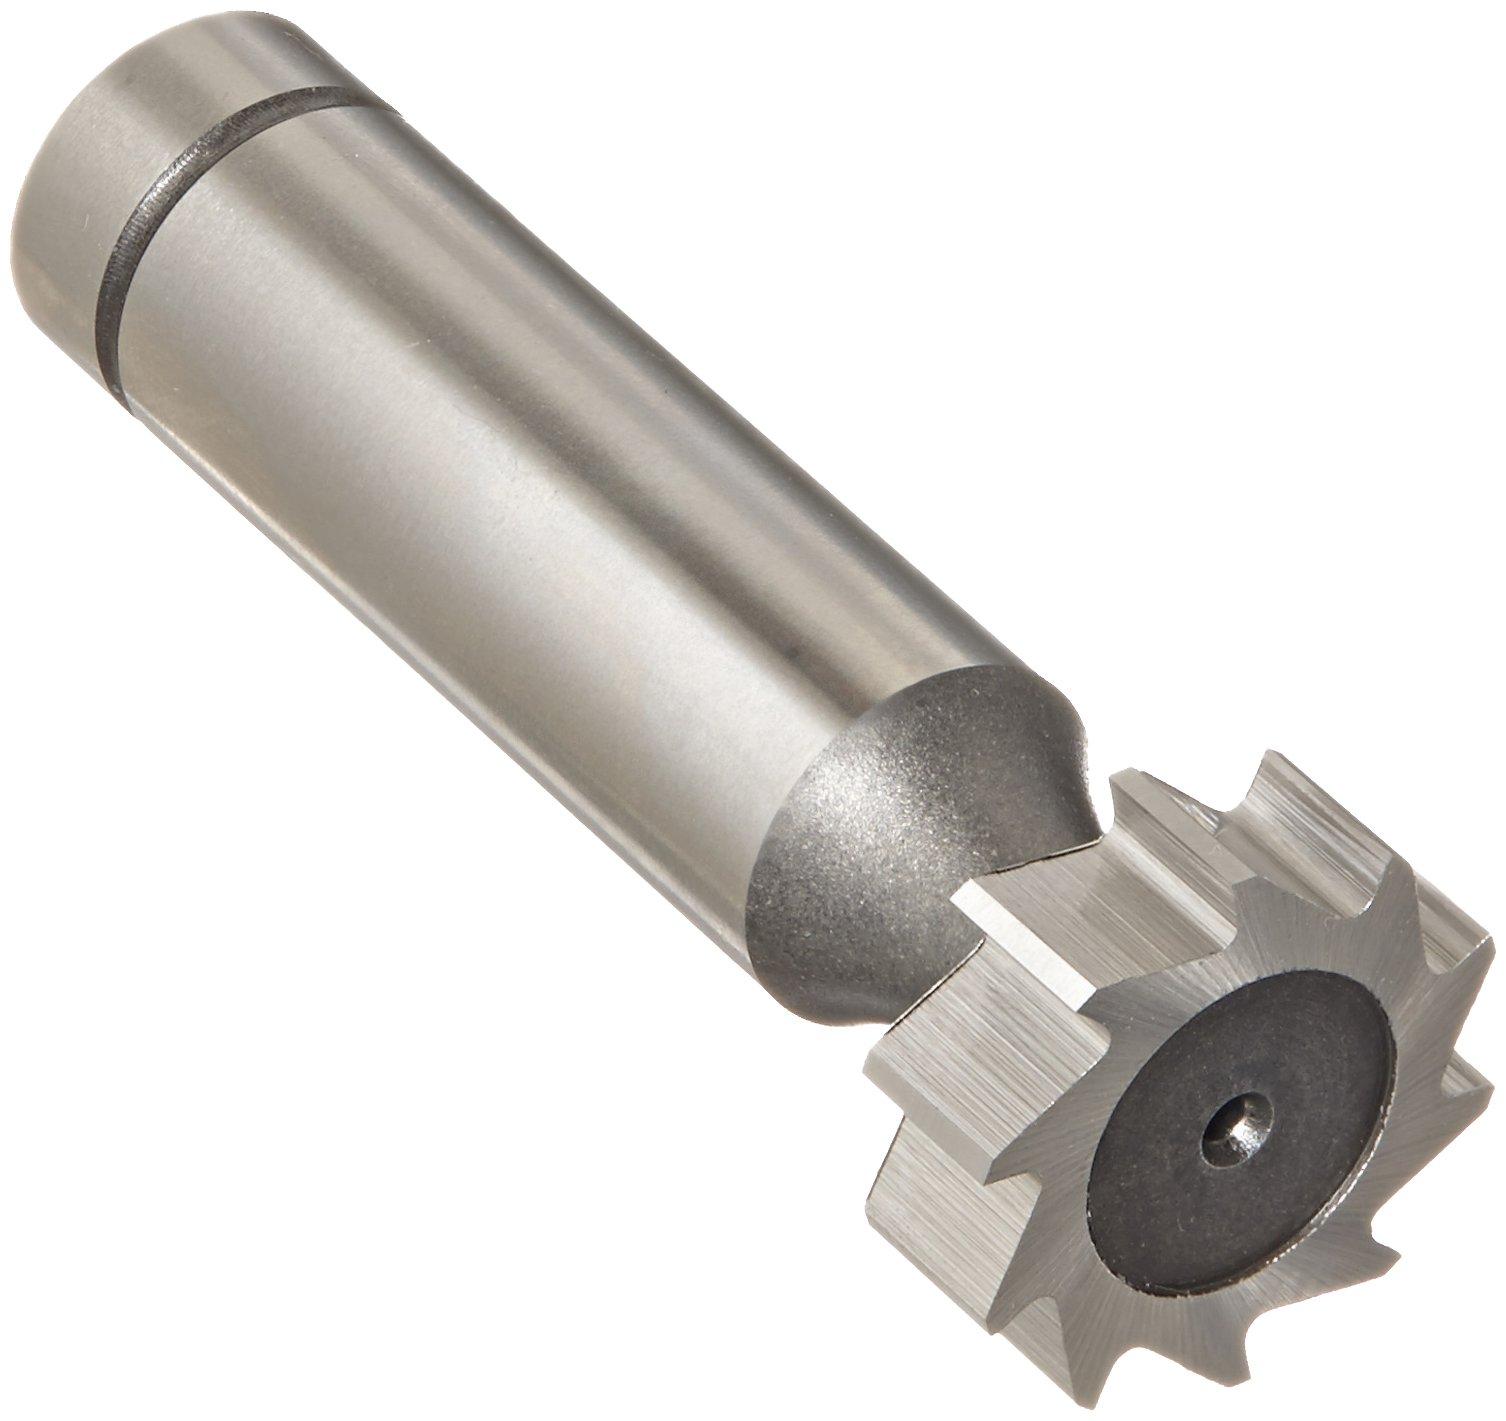 KEO 94022 Cobalt Steel Woodruff Keyseat Cutter, Uncoated (Bright) Finish, Round Shank, 1/2'' Shank Diameter, 3/4'' Cutter Diameter, 10 Straight Teeth, 1/4'' Face Width